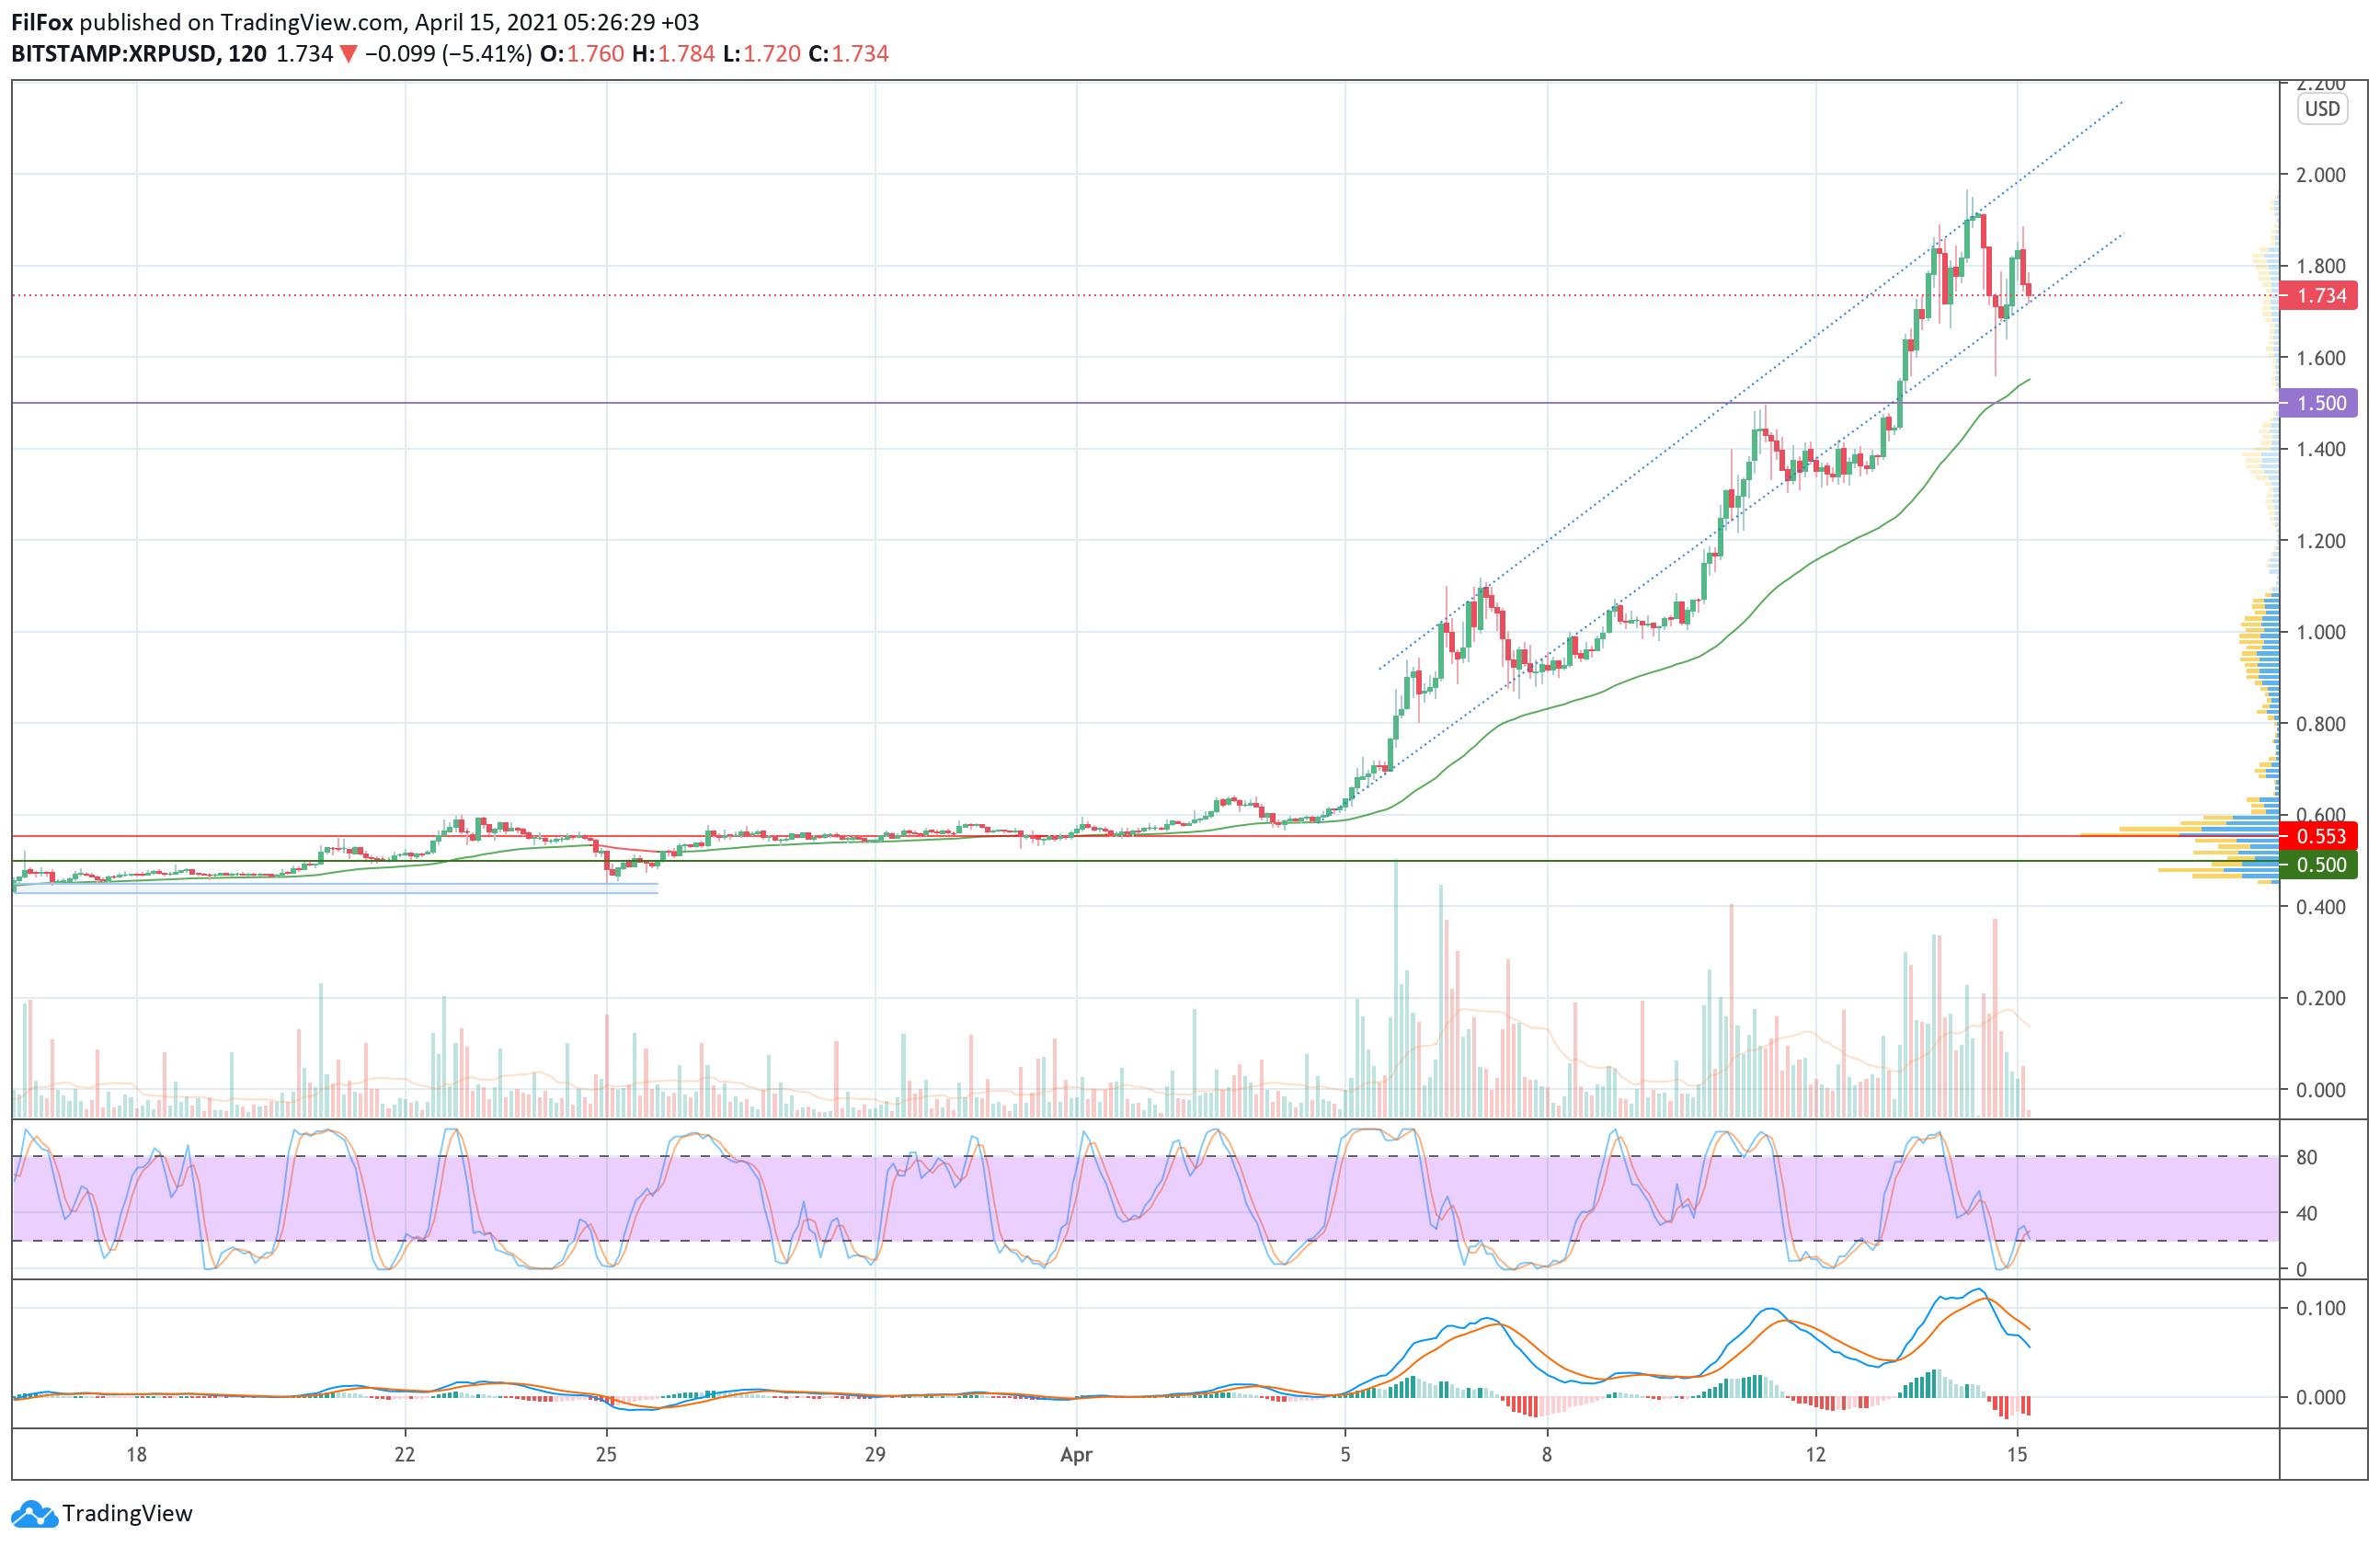 006696 - Анализ цен Bitcoin, Ethereum, XRP на 15.04.2021